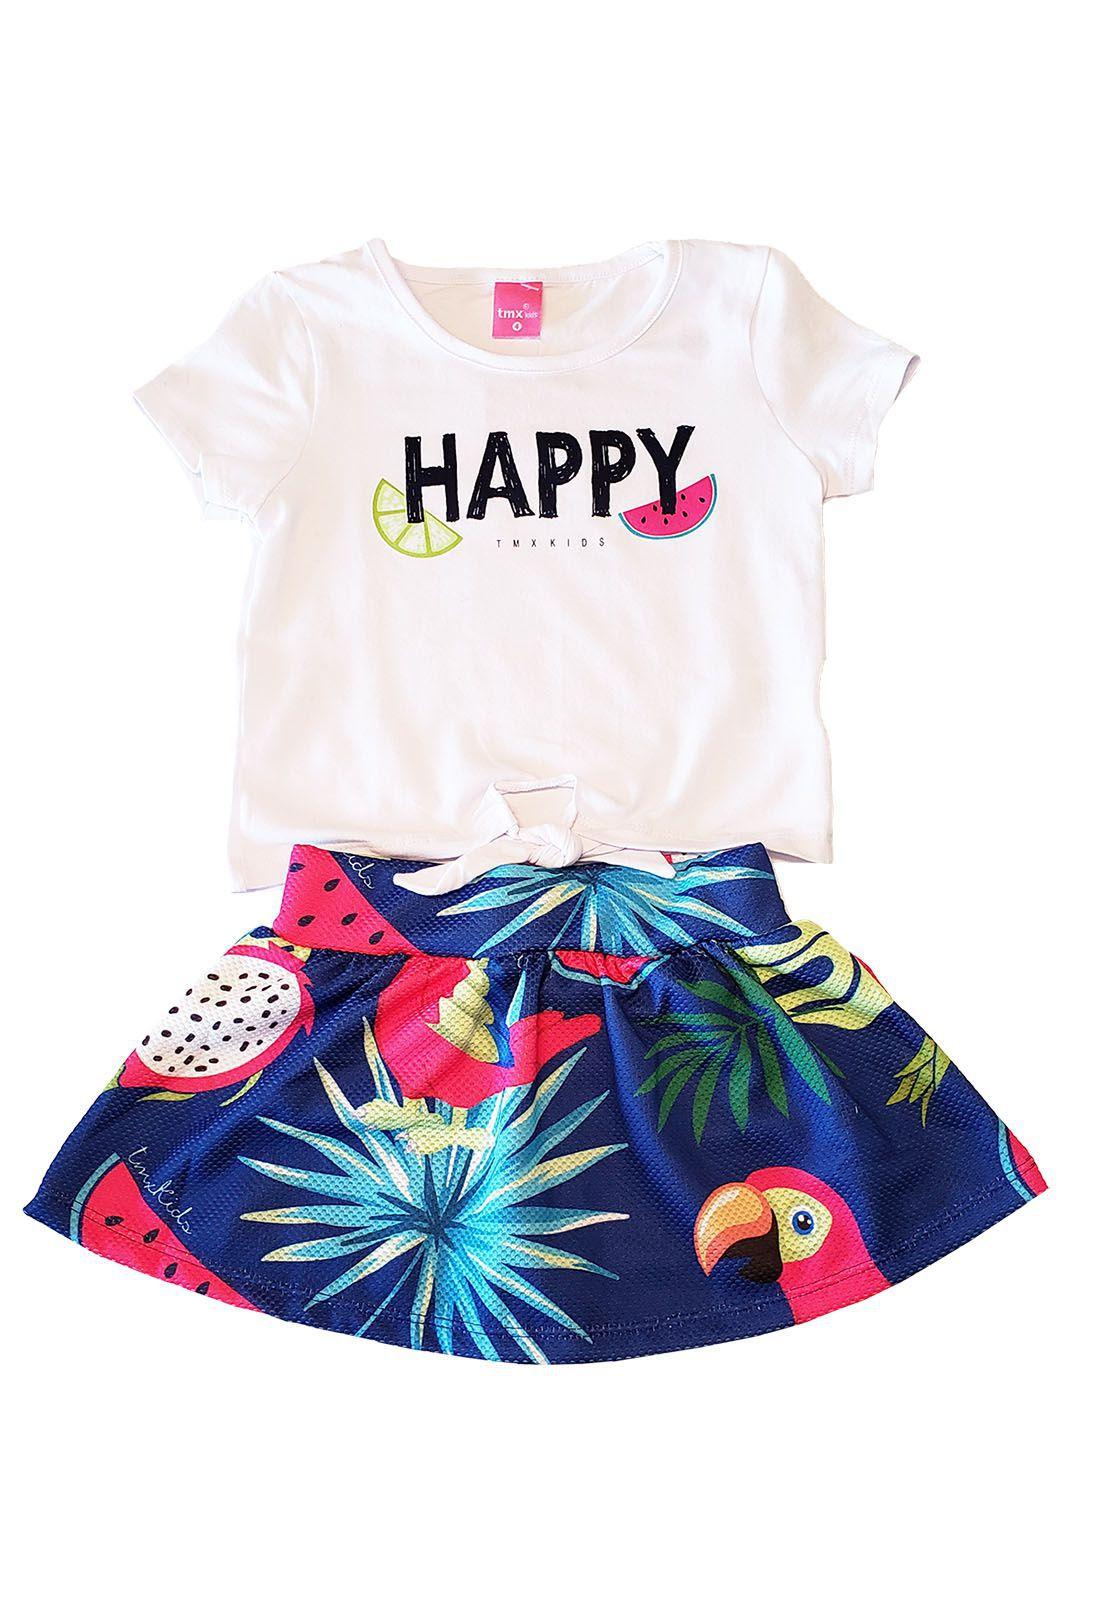 Conjunto Blusa  Cotton e Saia-Shorts Allure TMX Happy Marinho